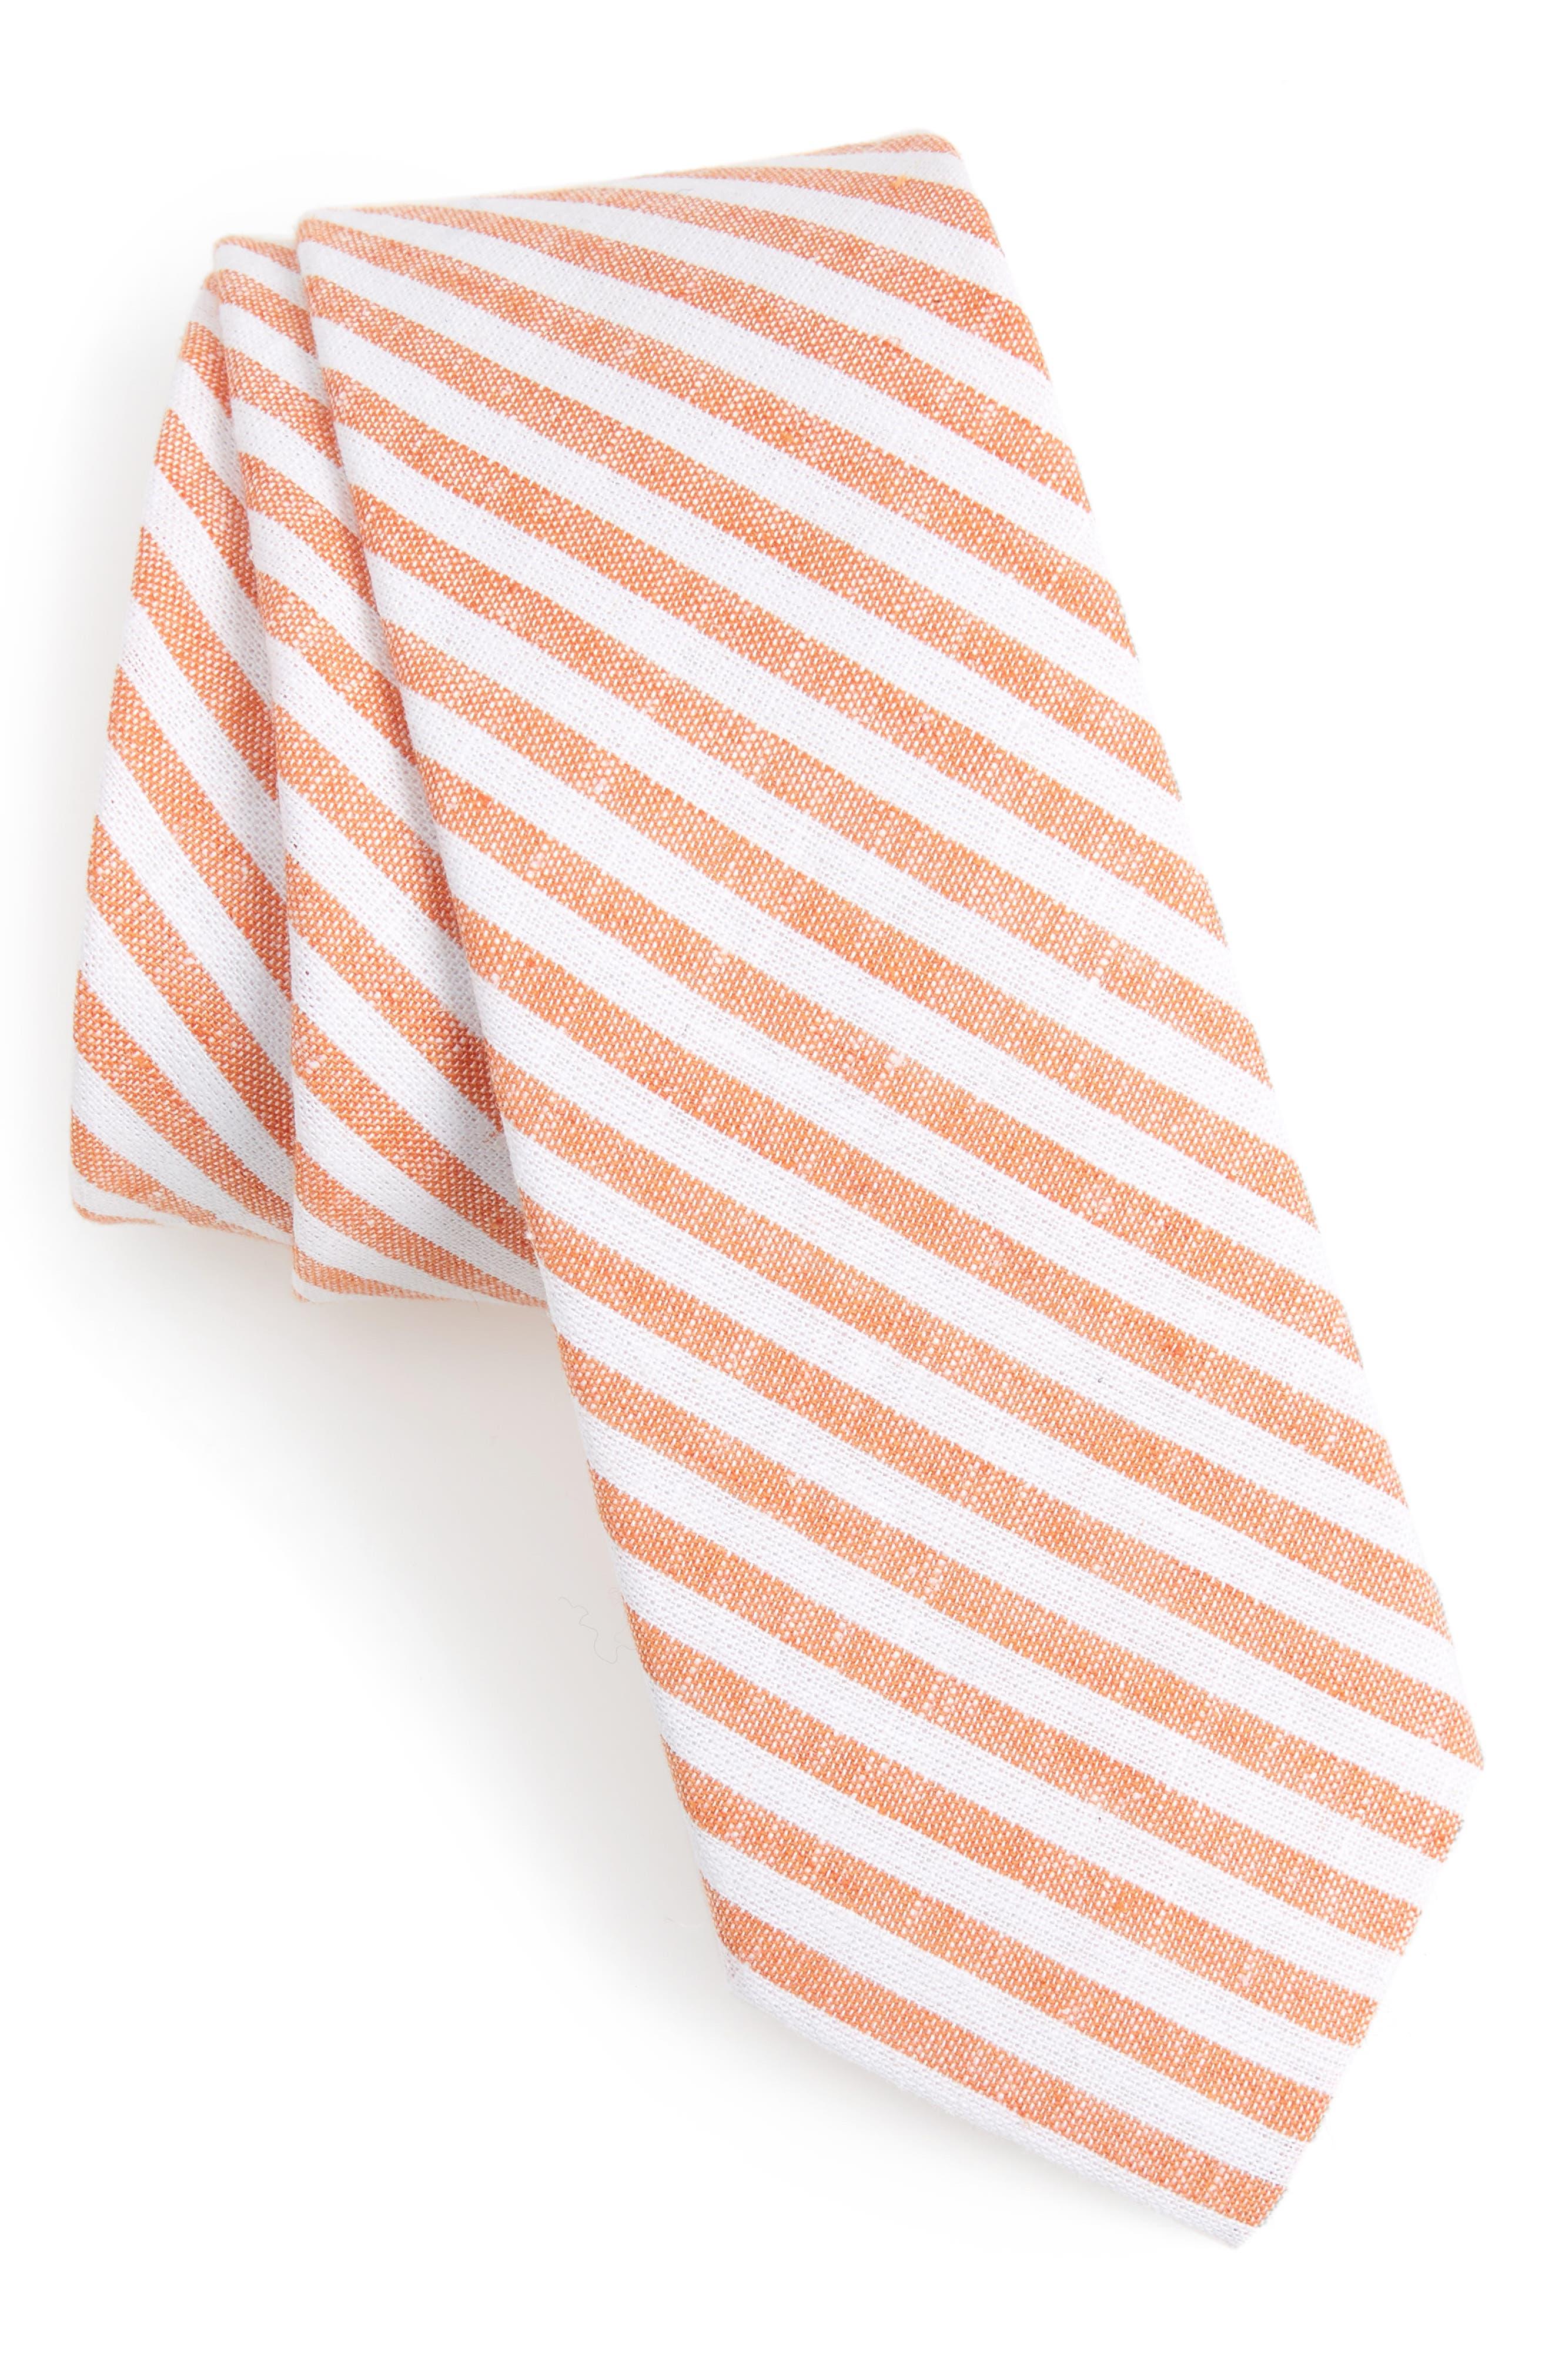 Telary Stripe Cotton Skinny Tie,                             Main thumbnail 3, color,